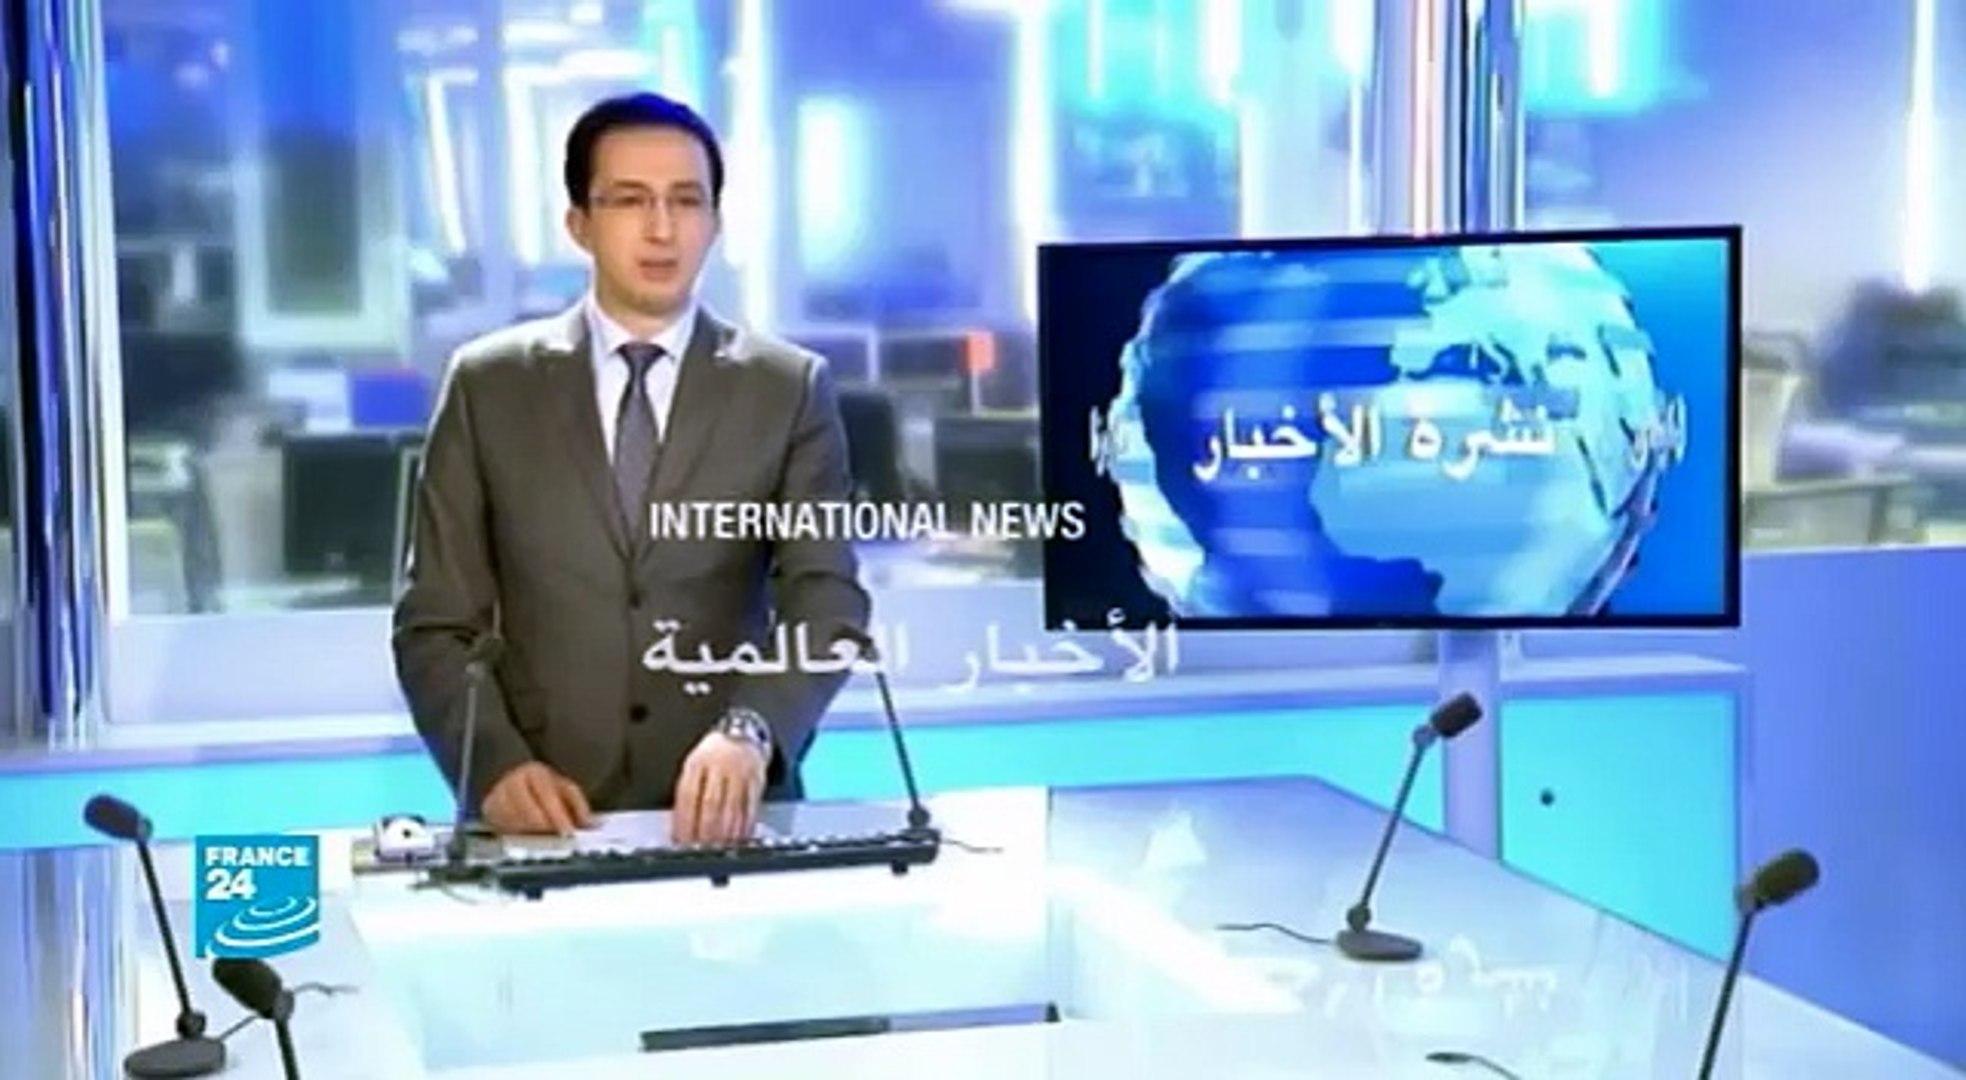 FRANCE 24: international news 24/7